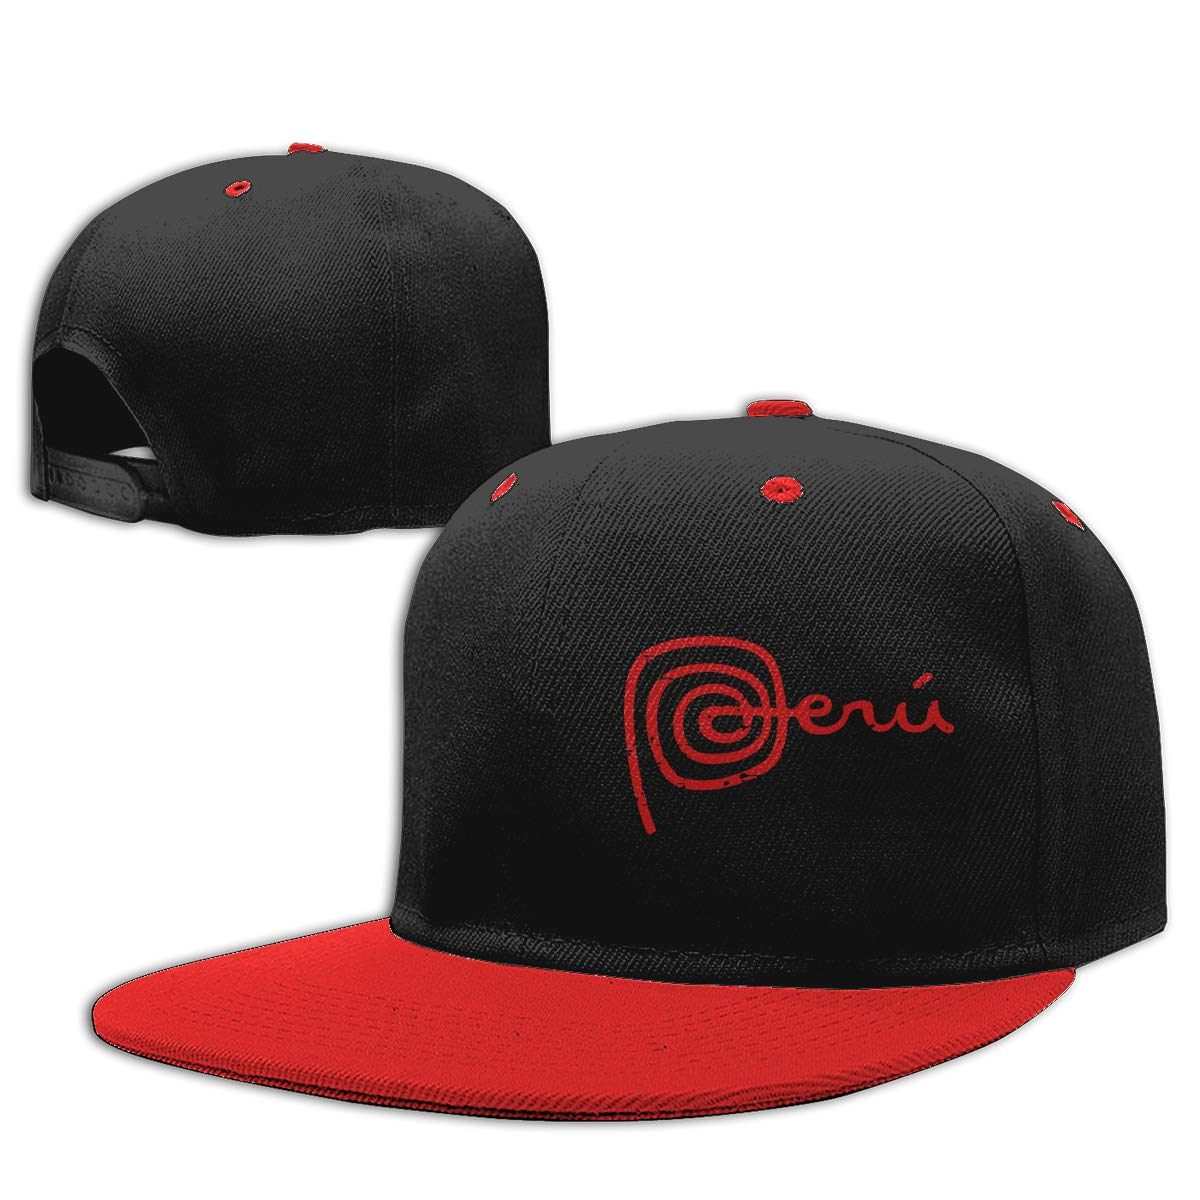 Peru Logo Printed Hip Hop Baseball Caps NMG-01 Men Womens Snapback Cap